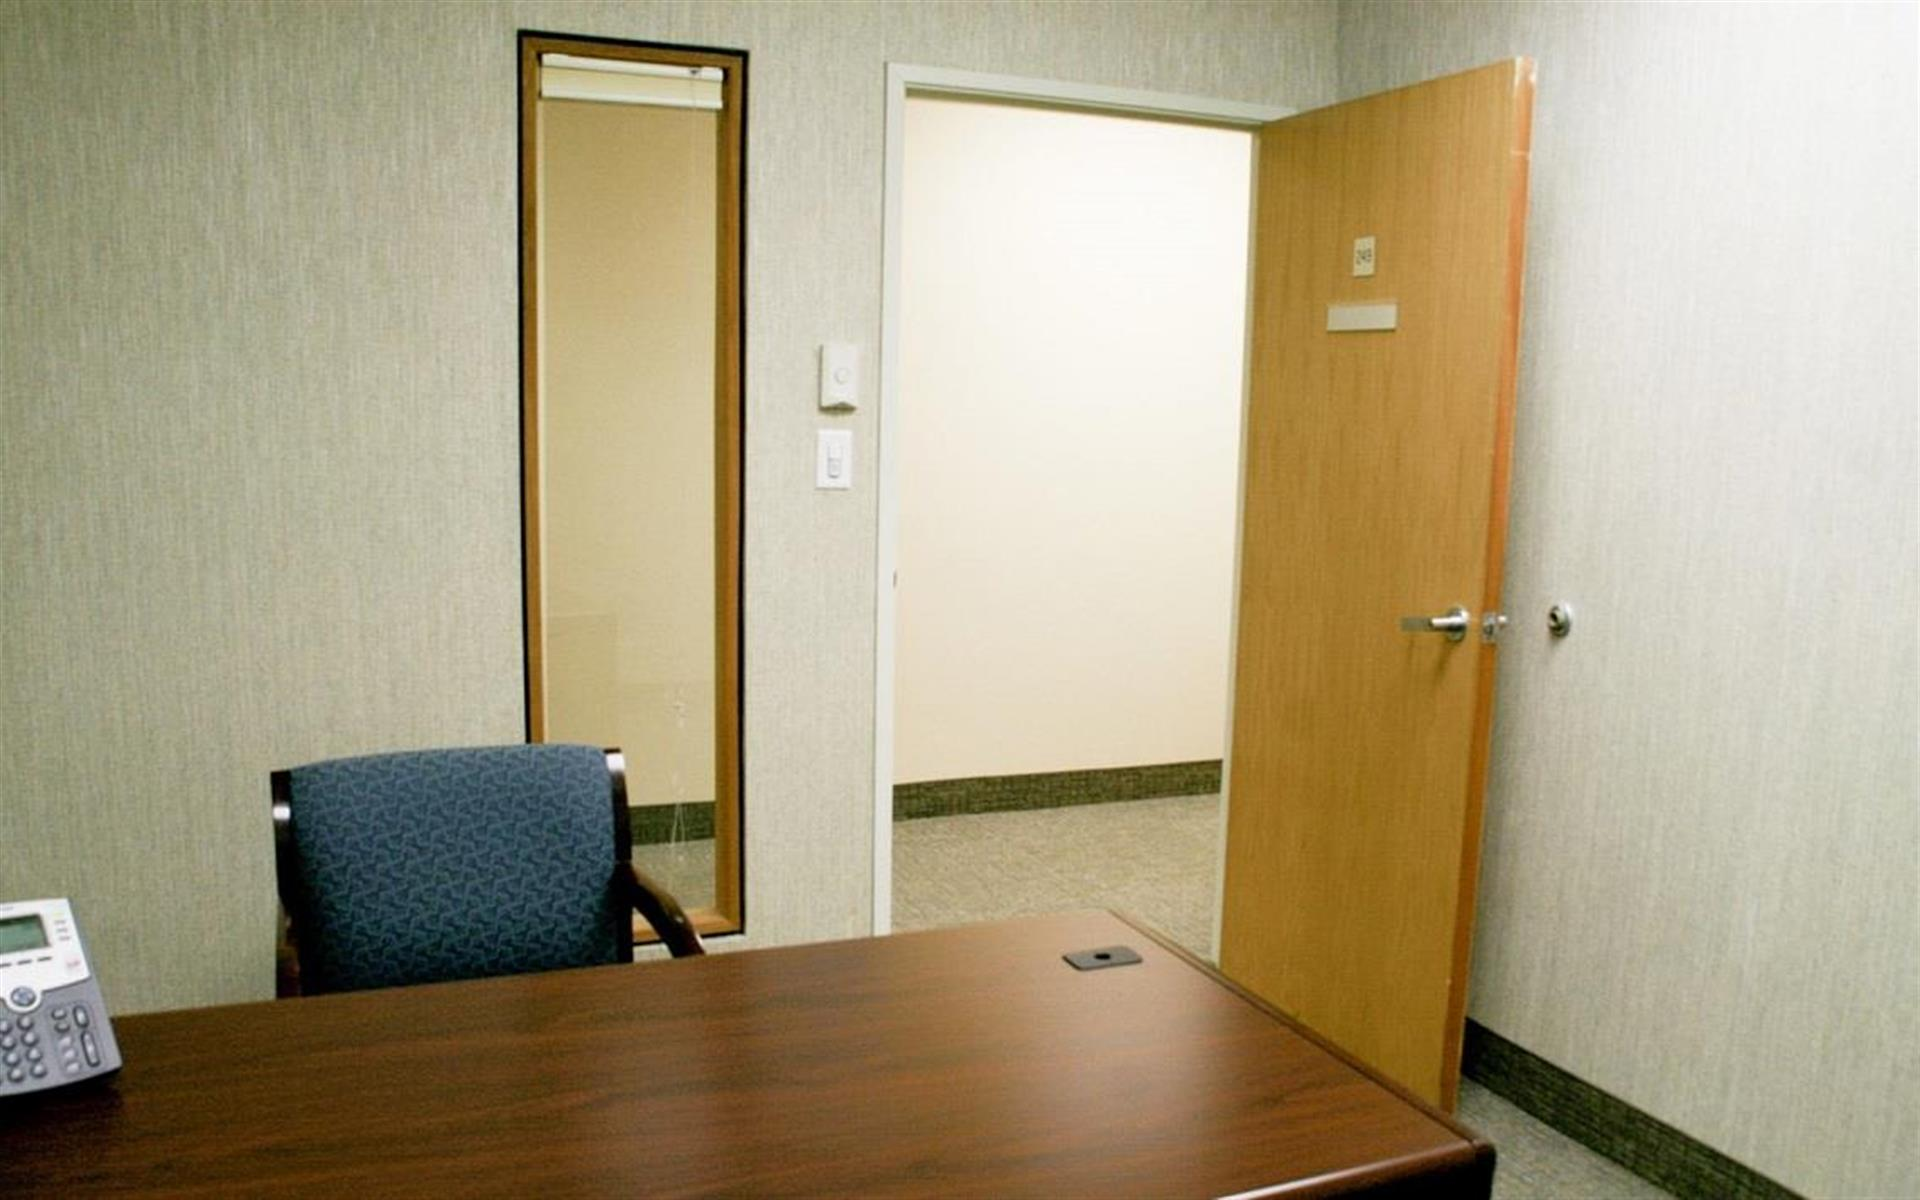 Atrium Executive Center, Mt. Laurel, NJ - Guest Office